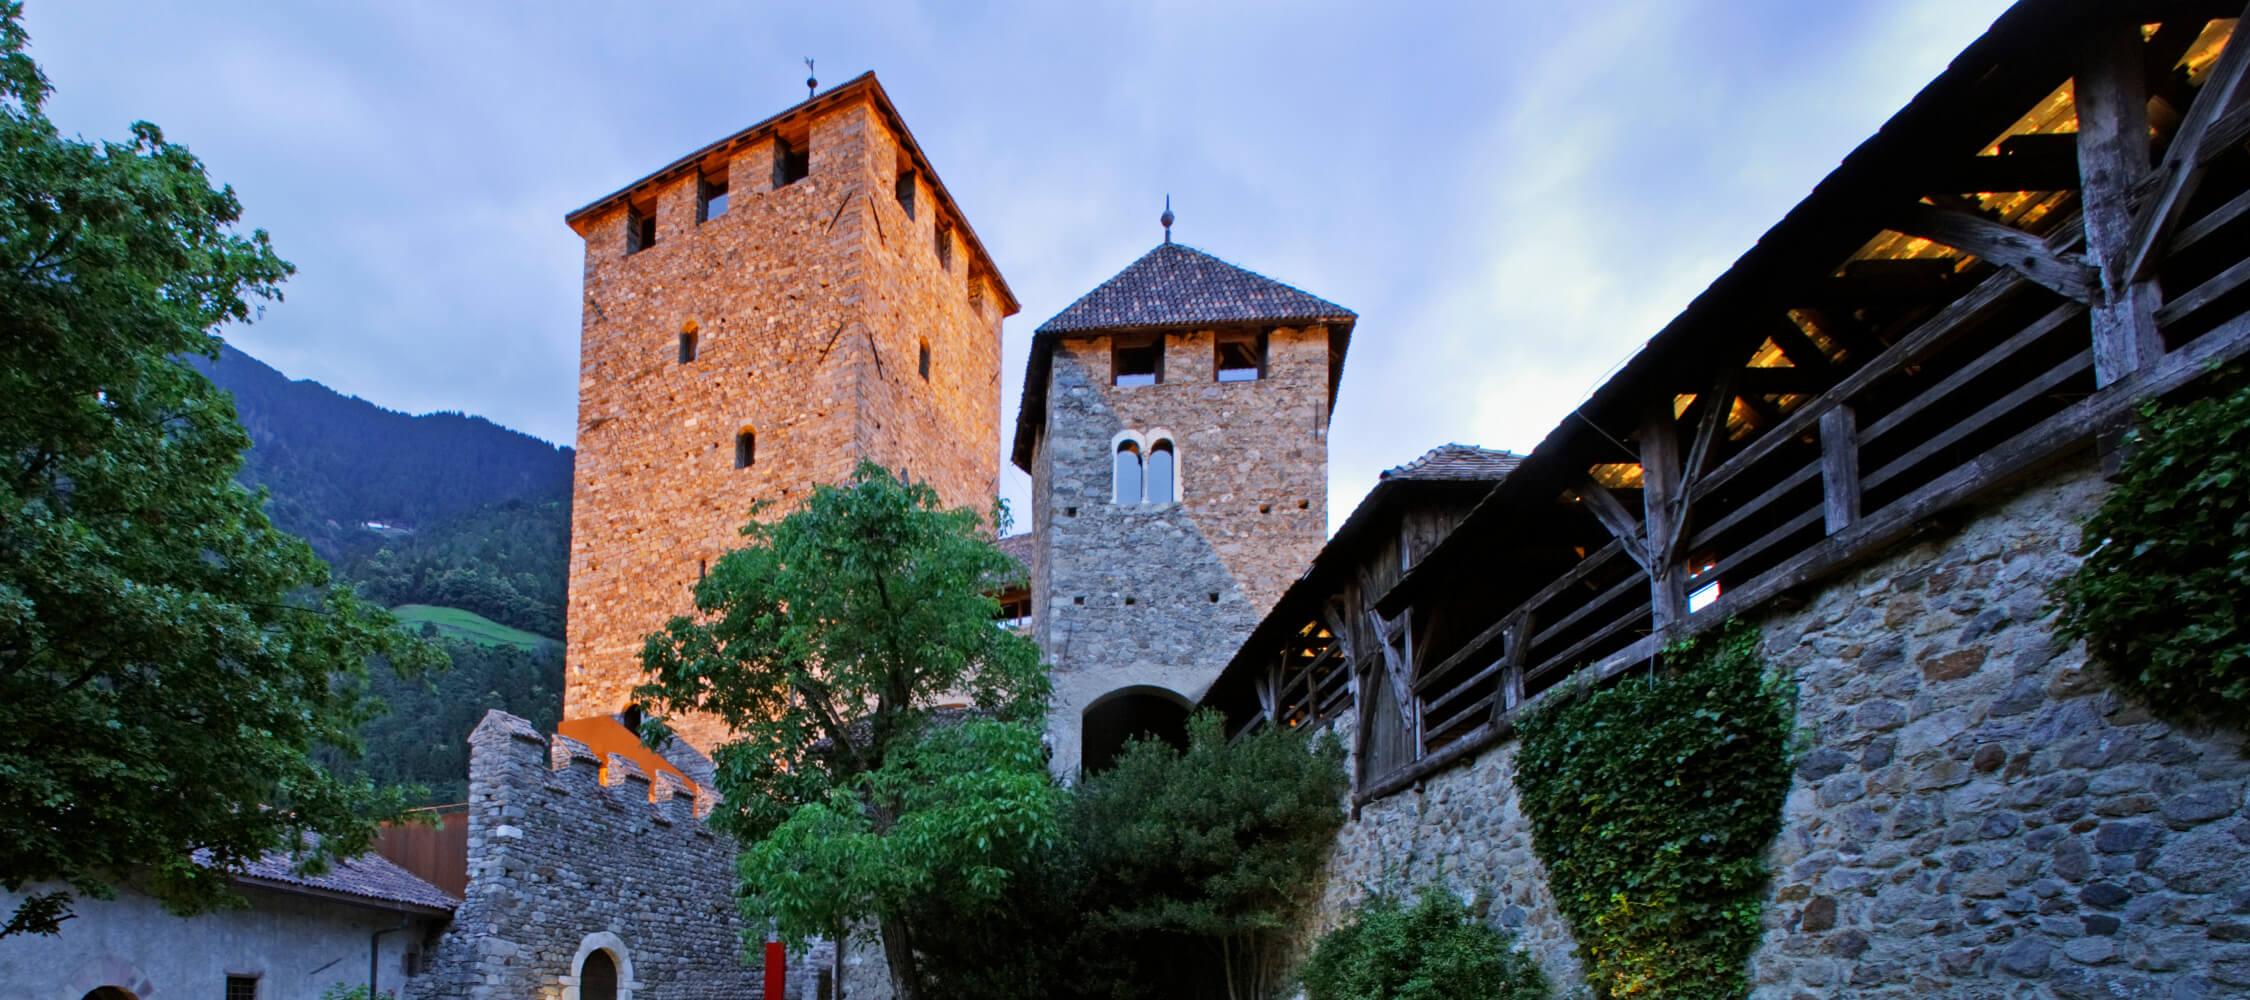 Italien-Trentino_Suedtirol_Alto_Adige_Merano_Meran_Besichtigen_Kultur_Museum_Schloss_Tirol_Event_Convention_MGM-Frieder-Blickle_mgm00148frbl_2250x1000